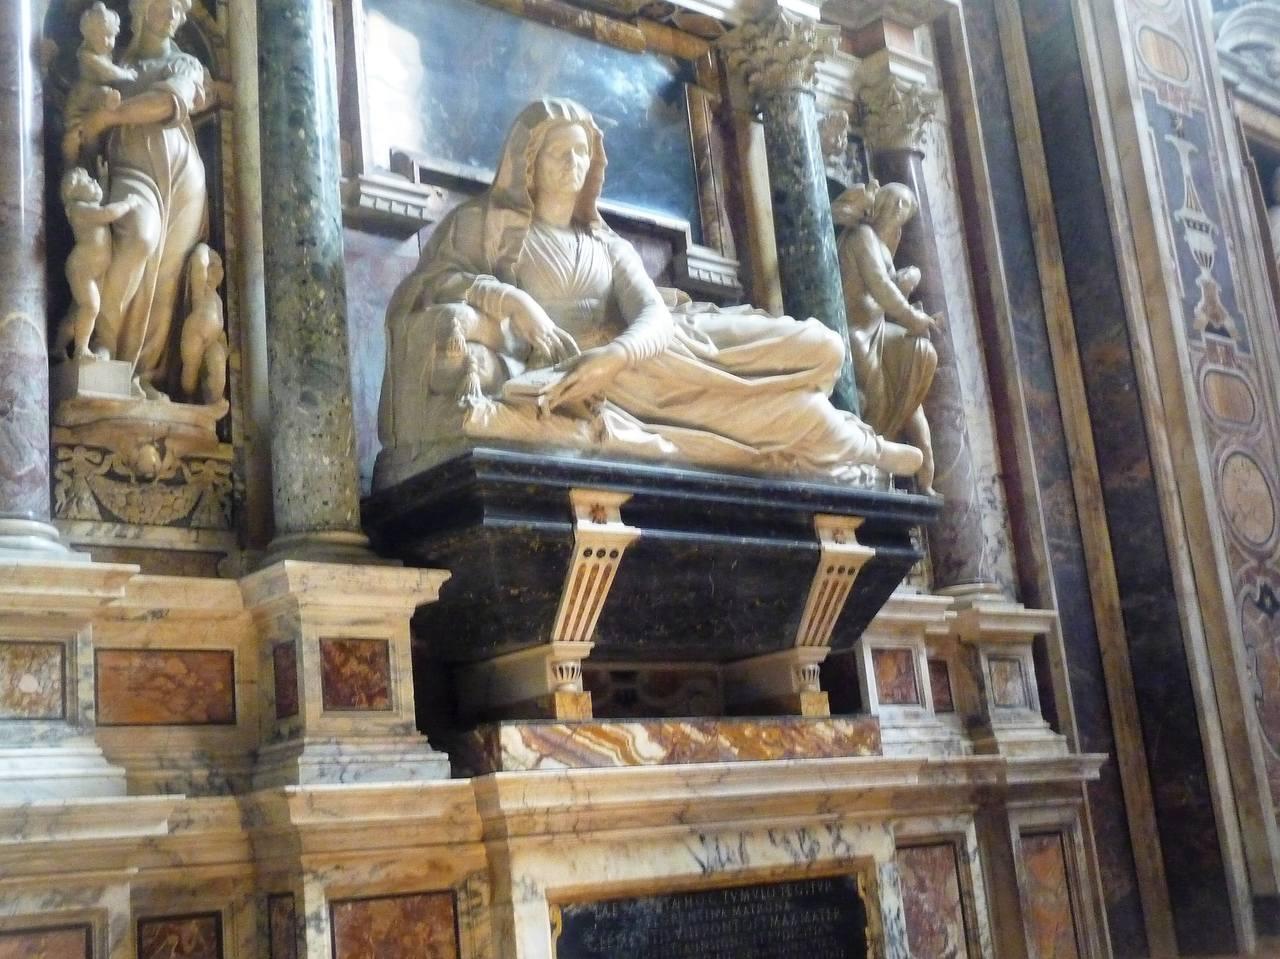 Santa Maria sopra Minerva (46)